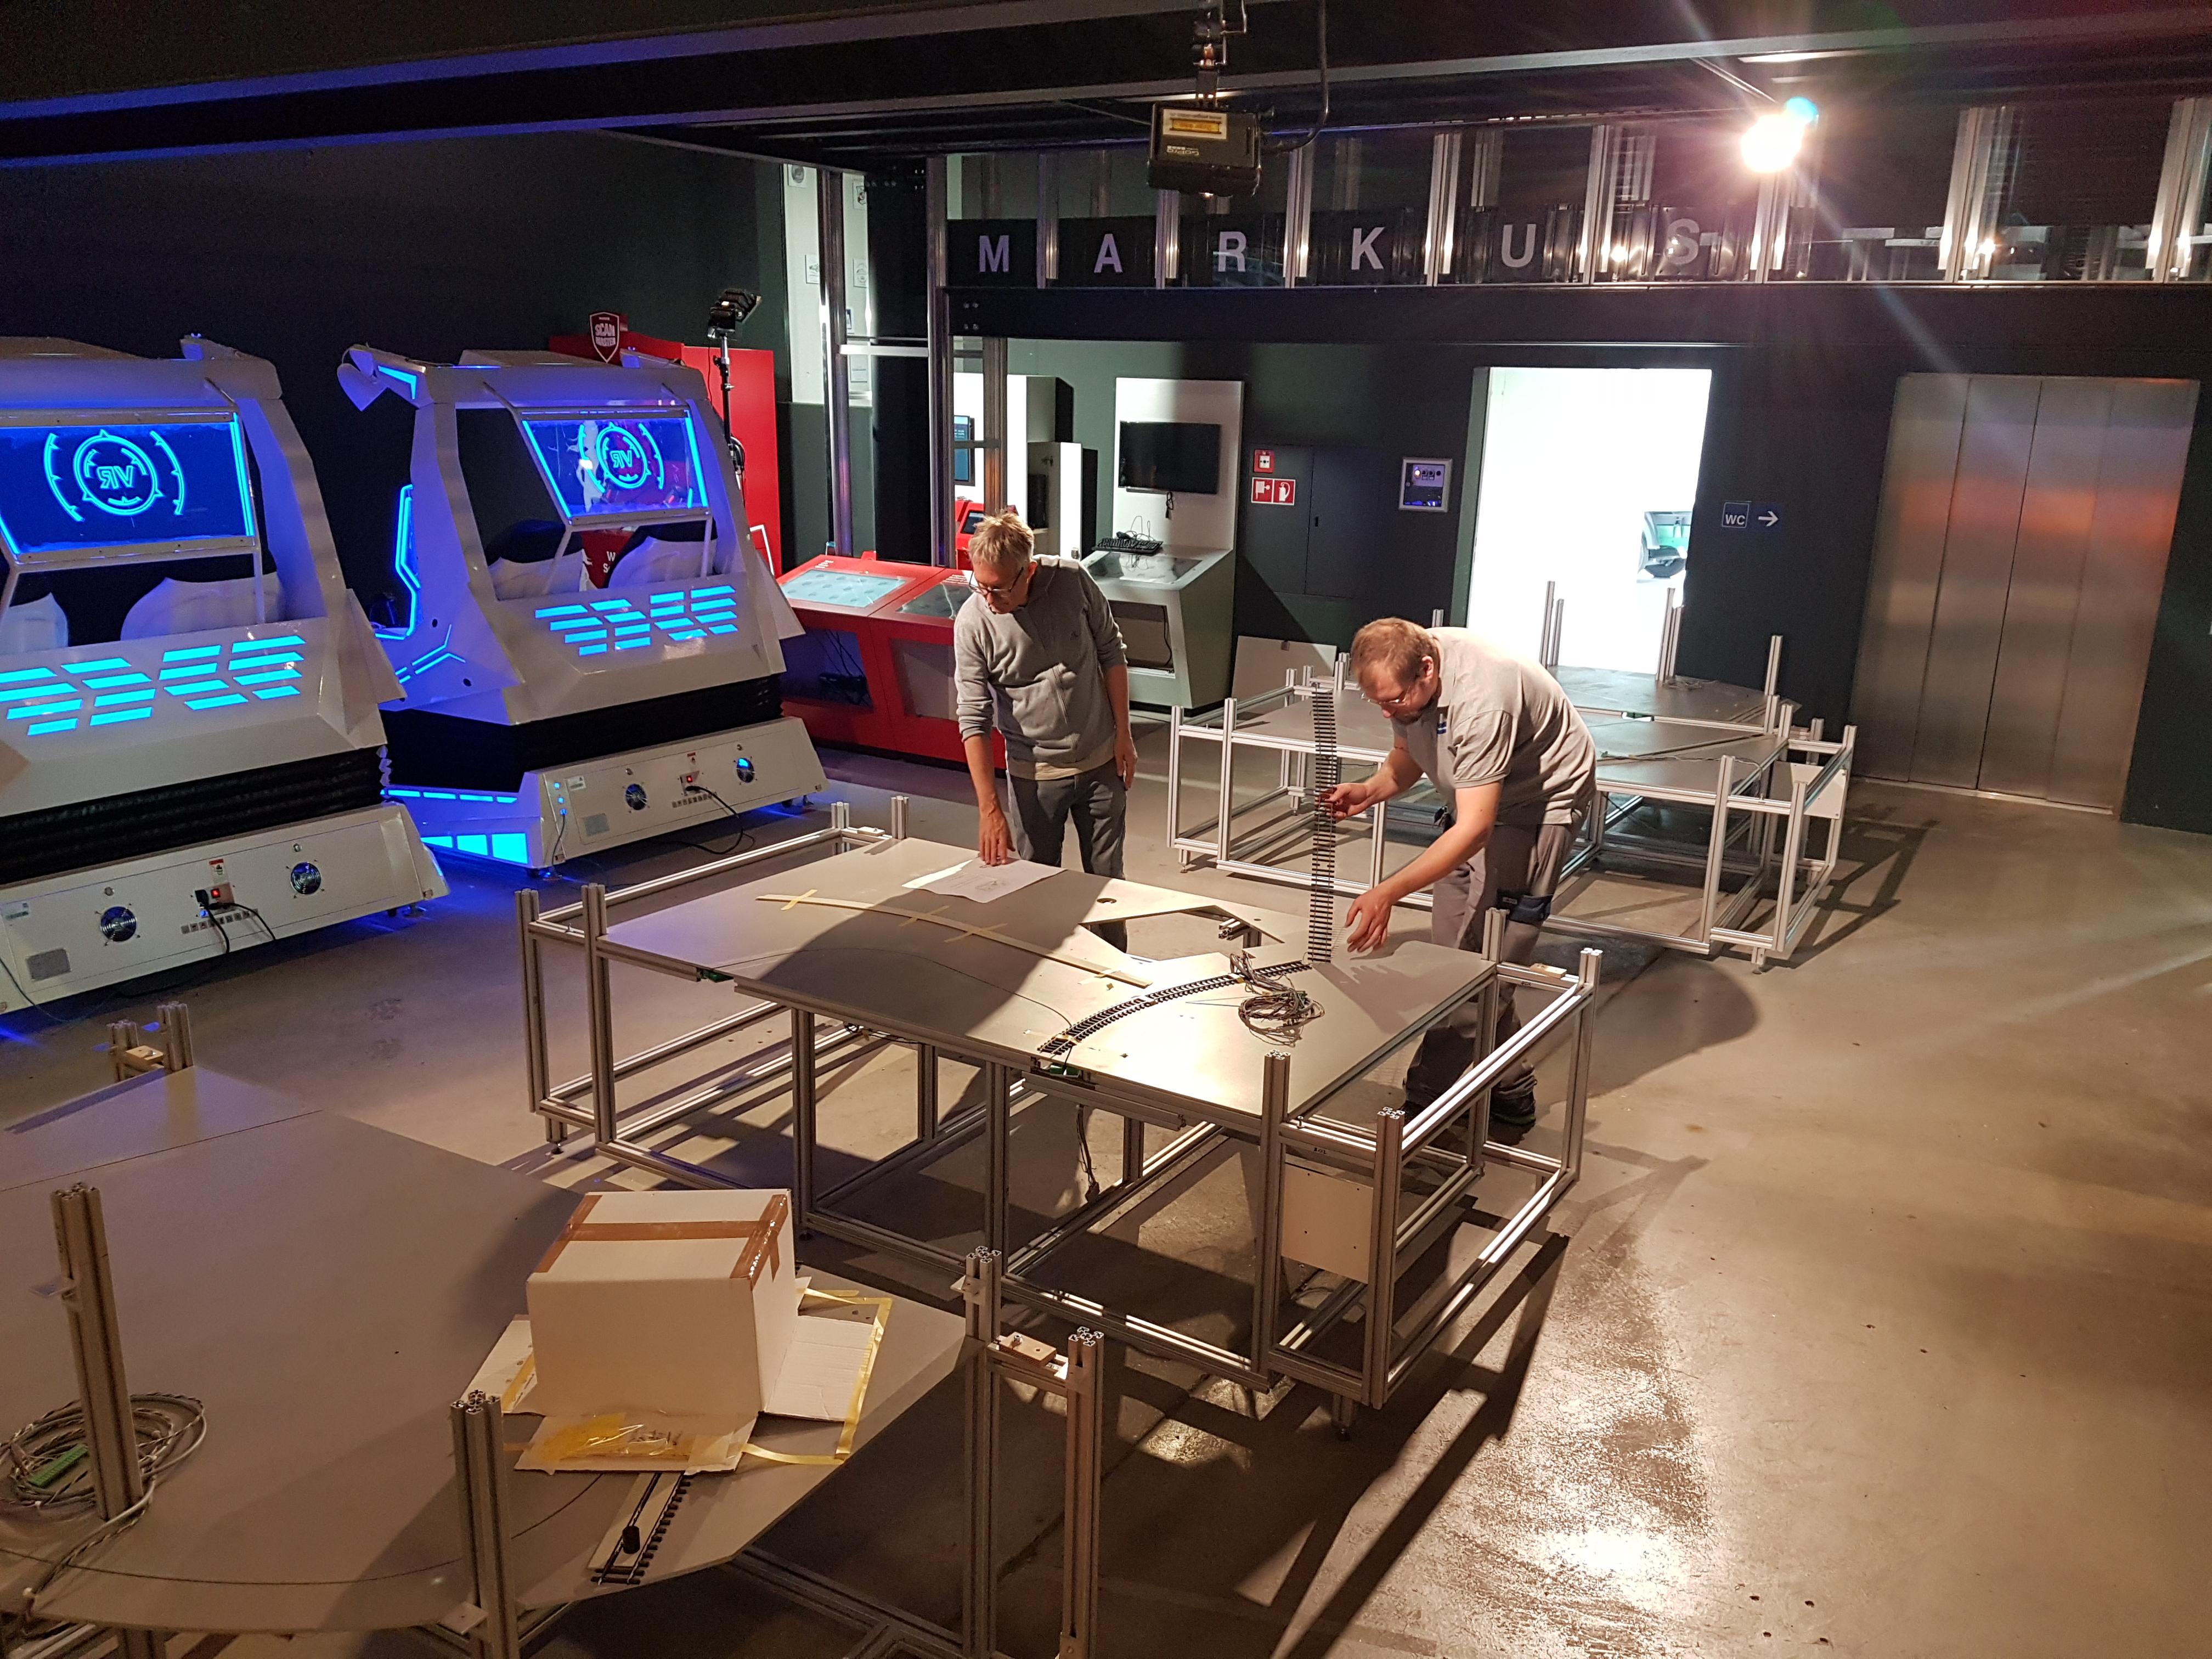 Galliker Transport AG im Verkehrshaus der Schweiz mit dem interaktiven Miniaturmodell